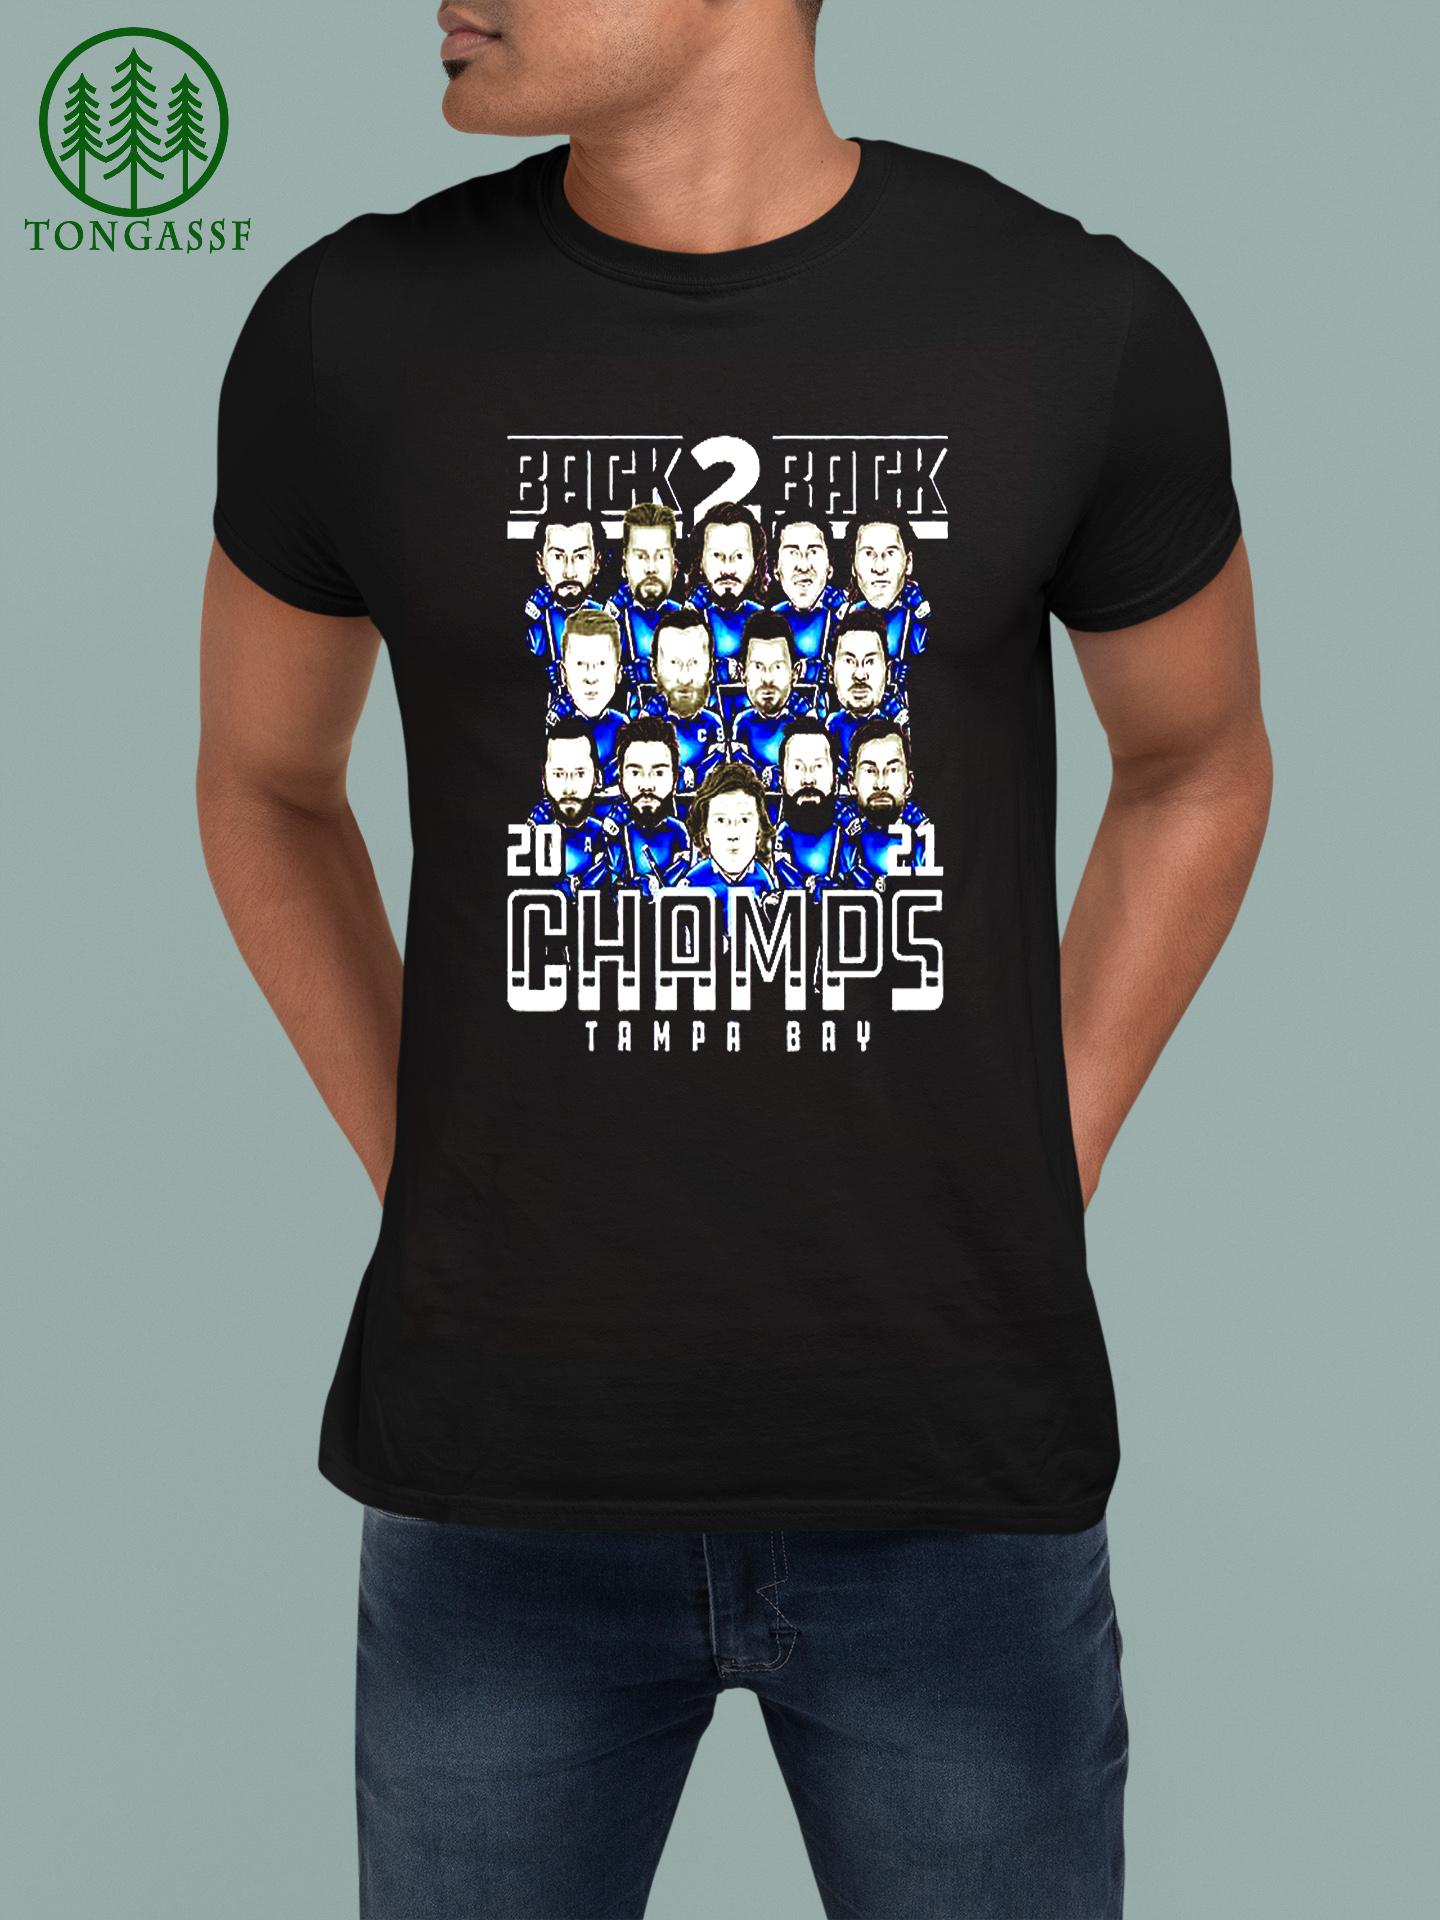 Tampa bay hockey back 2 back 2021 champs t shirt